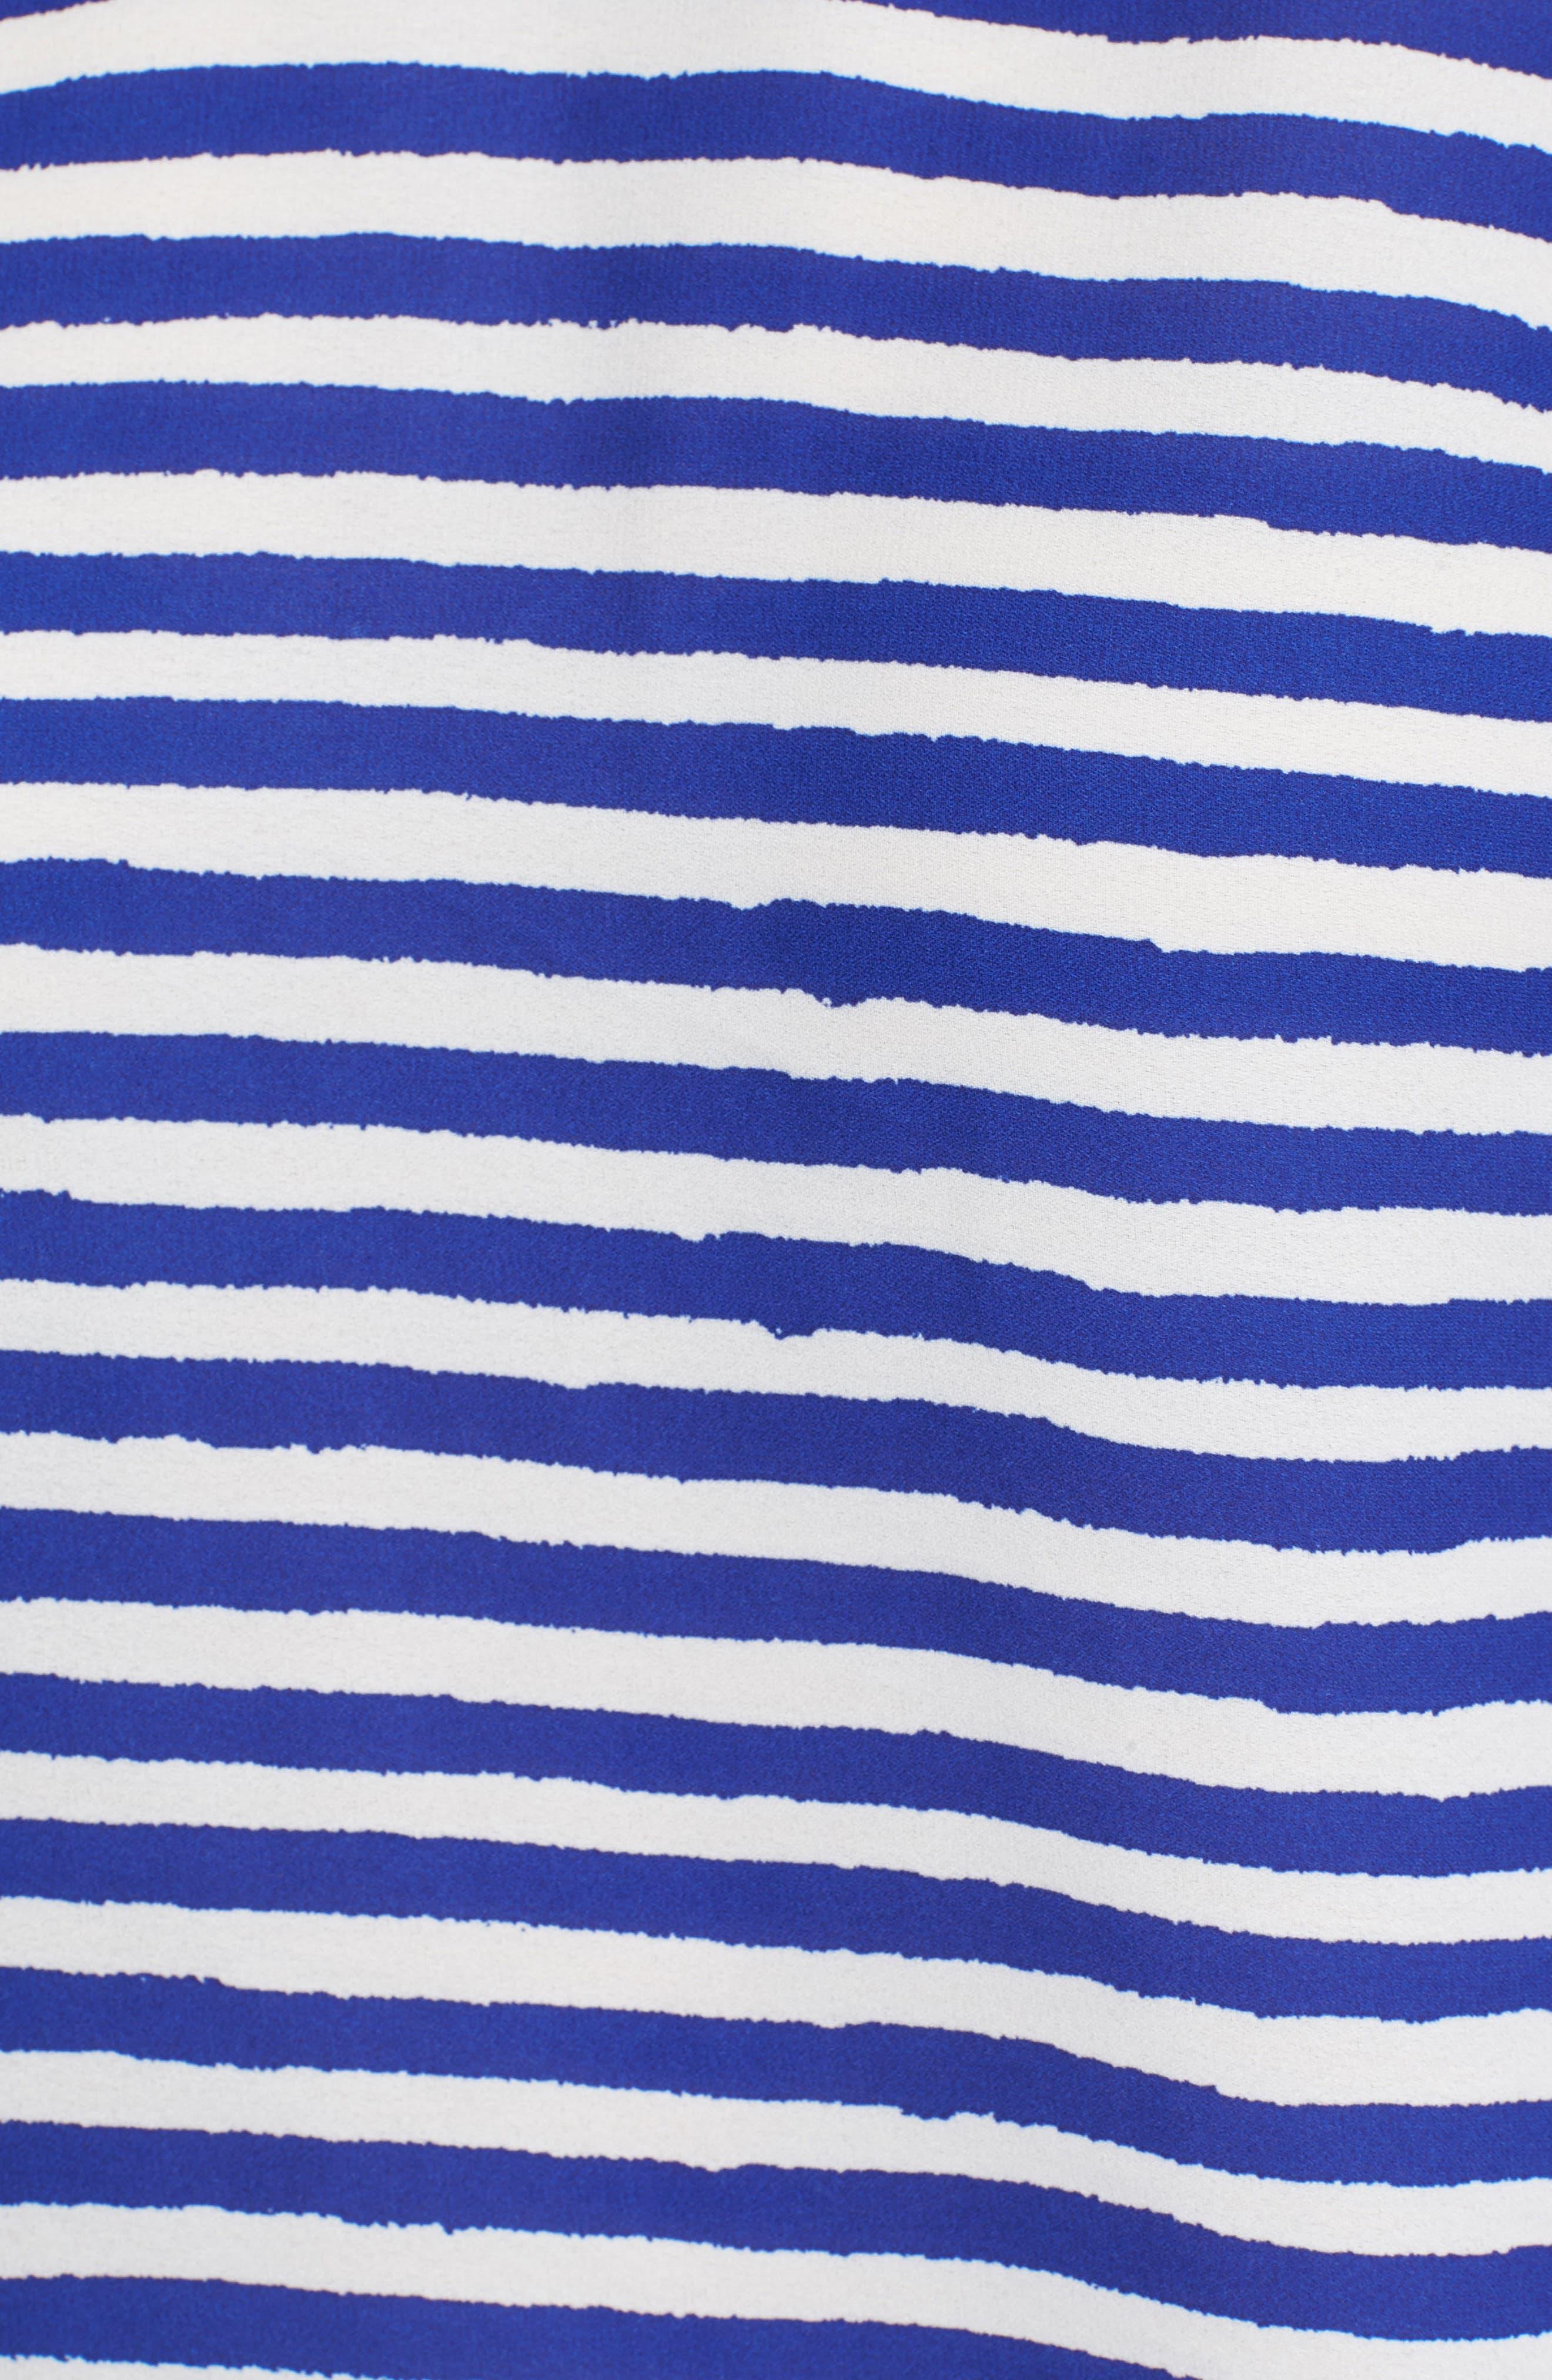 Tulip Sleeve Stripe Blouse,                             Alternate thumbnail 5, color,                             400